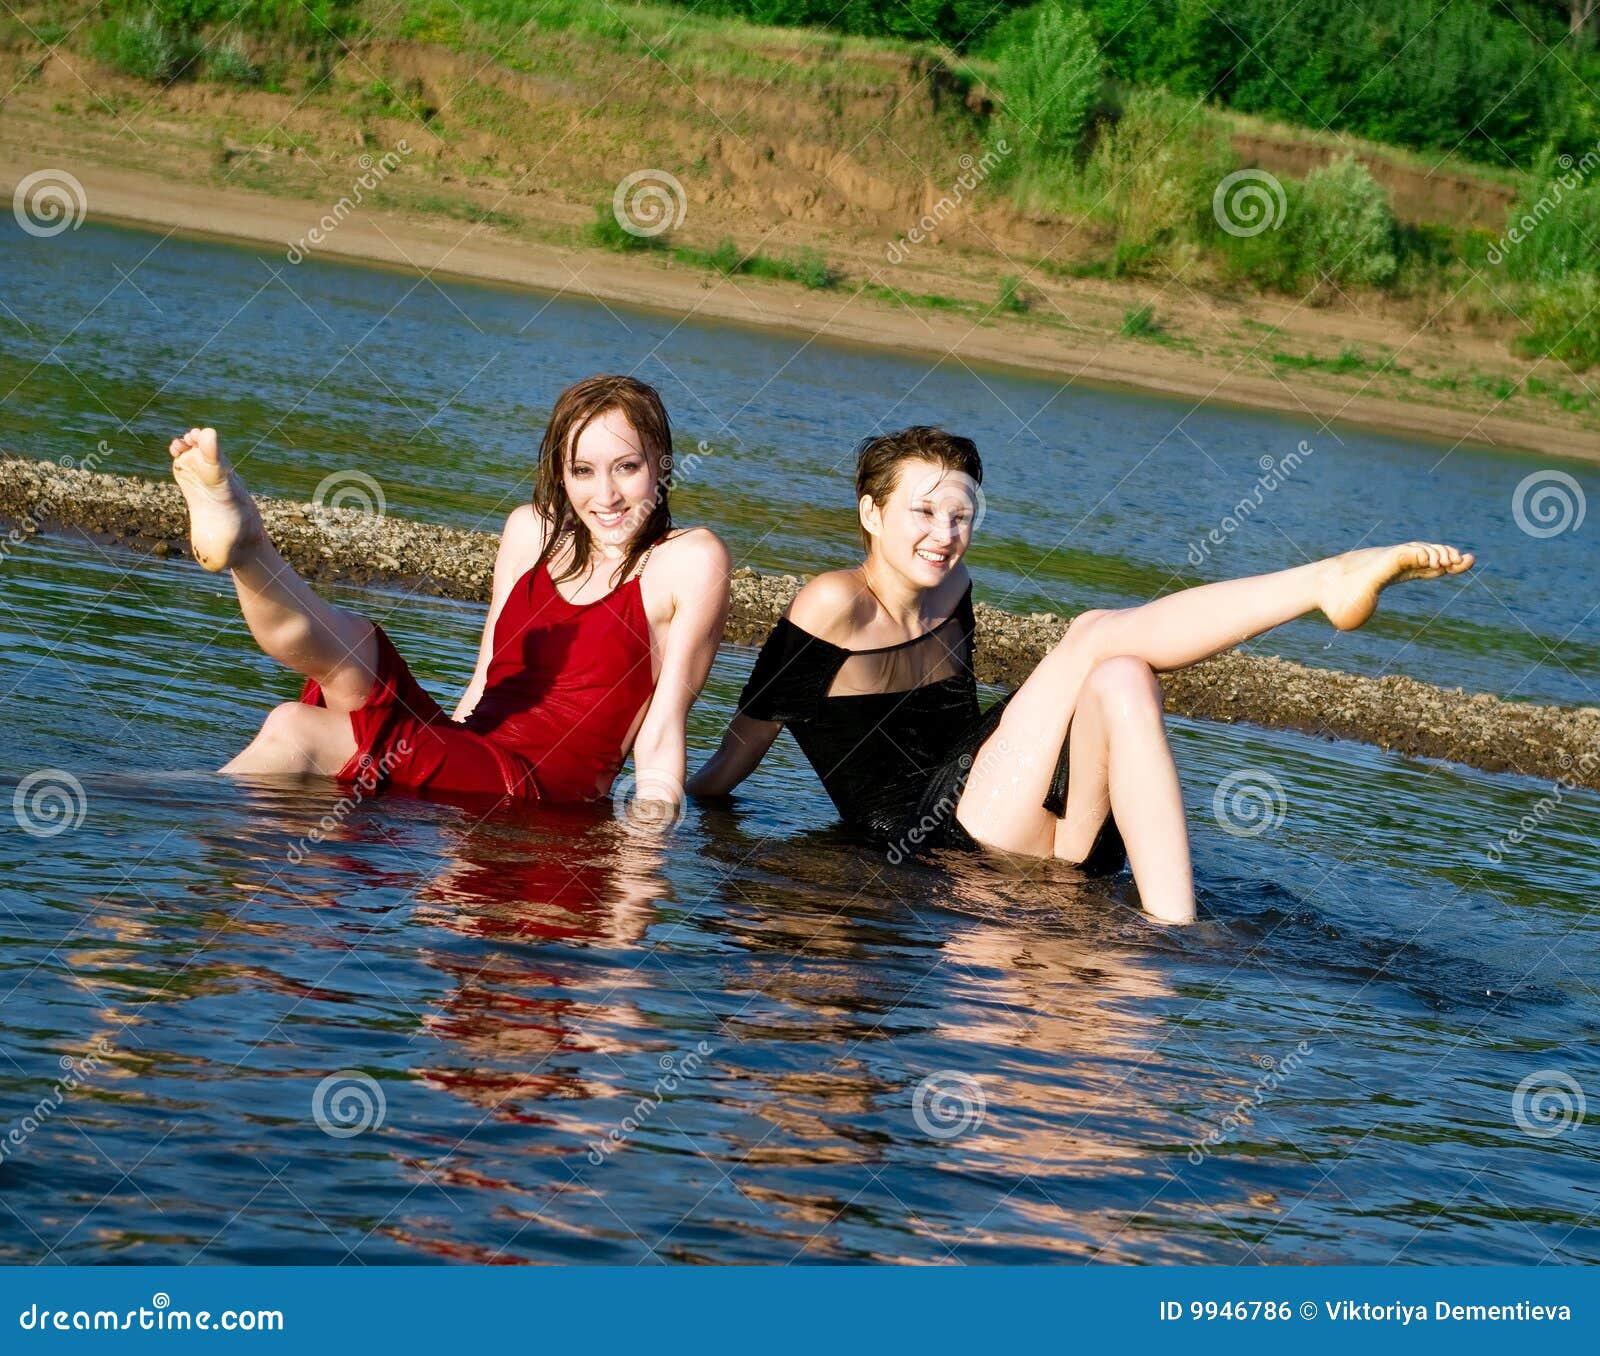 Water Dresses for Girls